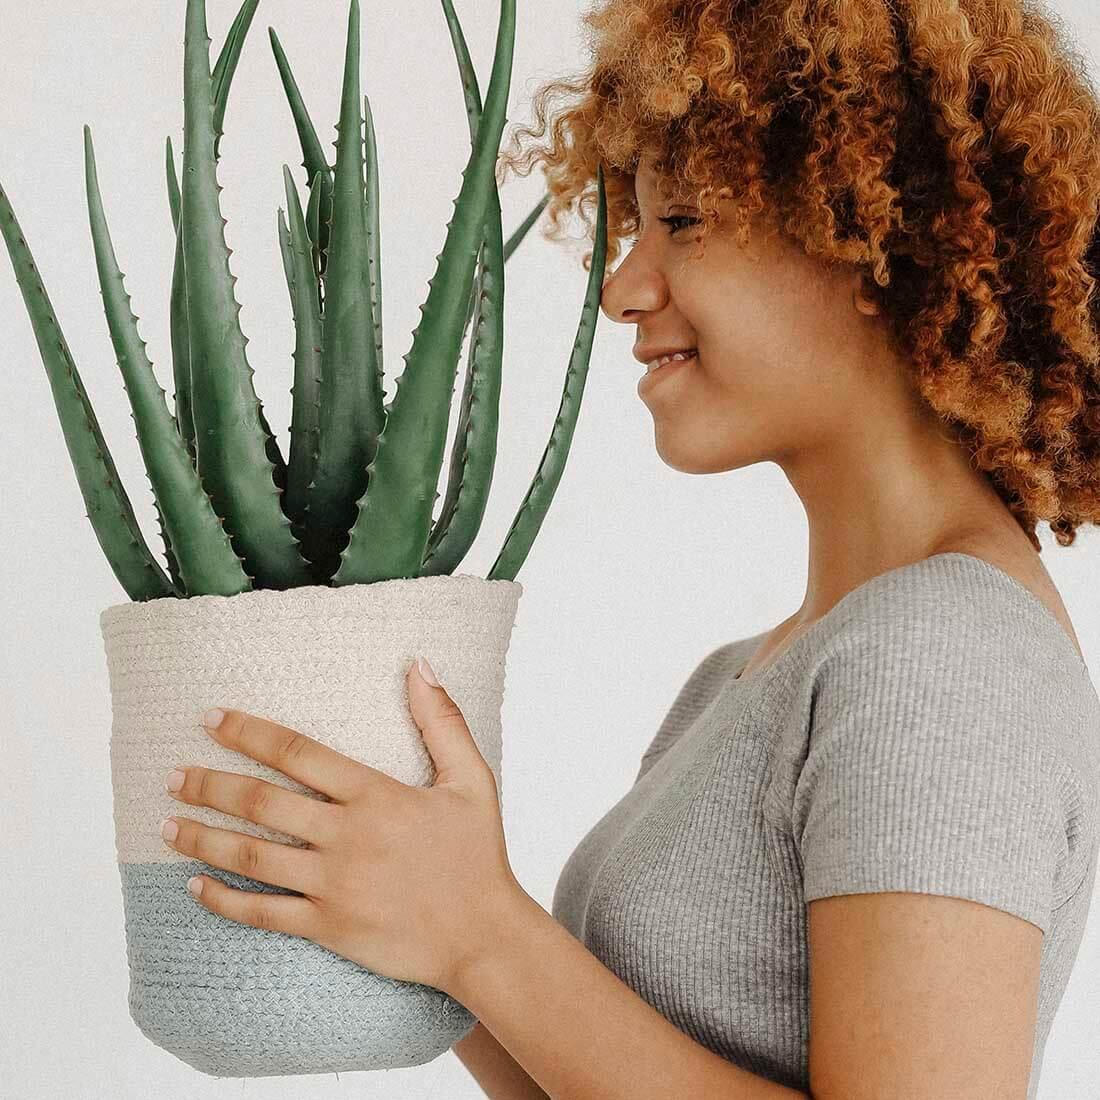 planta-crescimento-e-desconforto